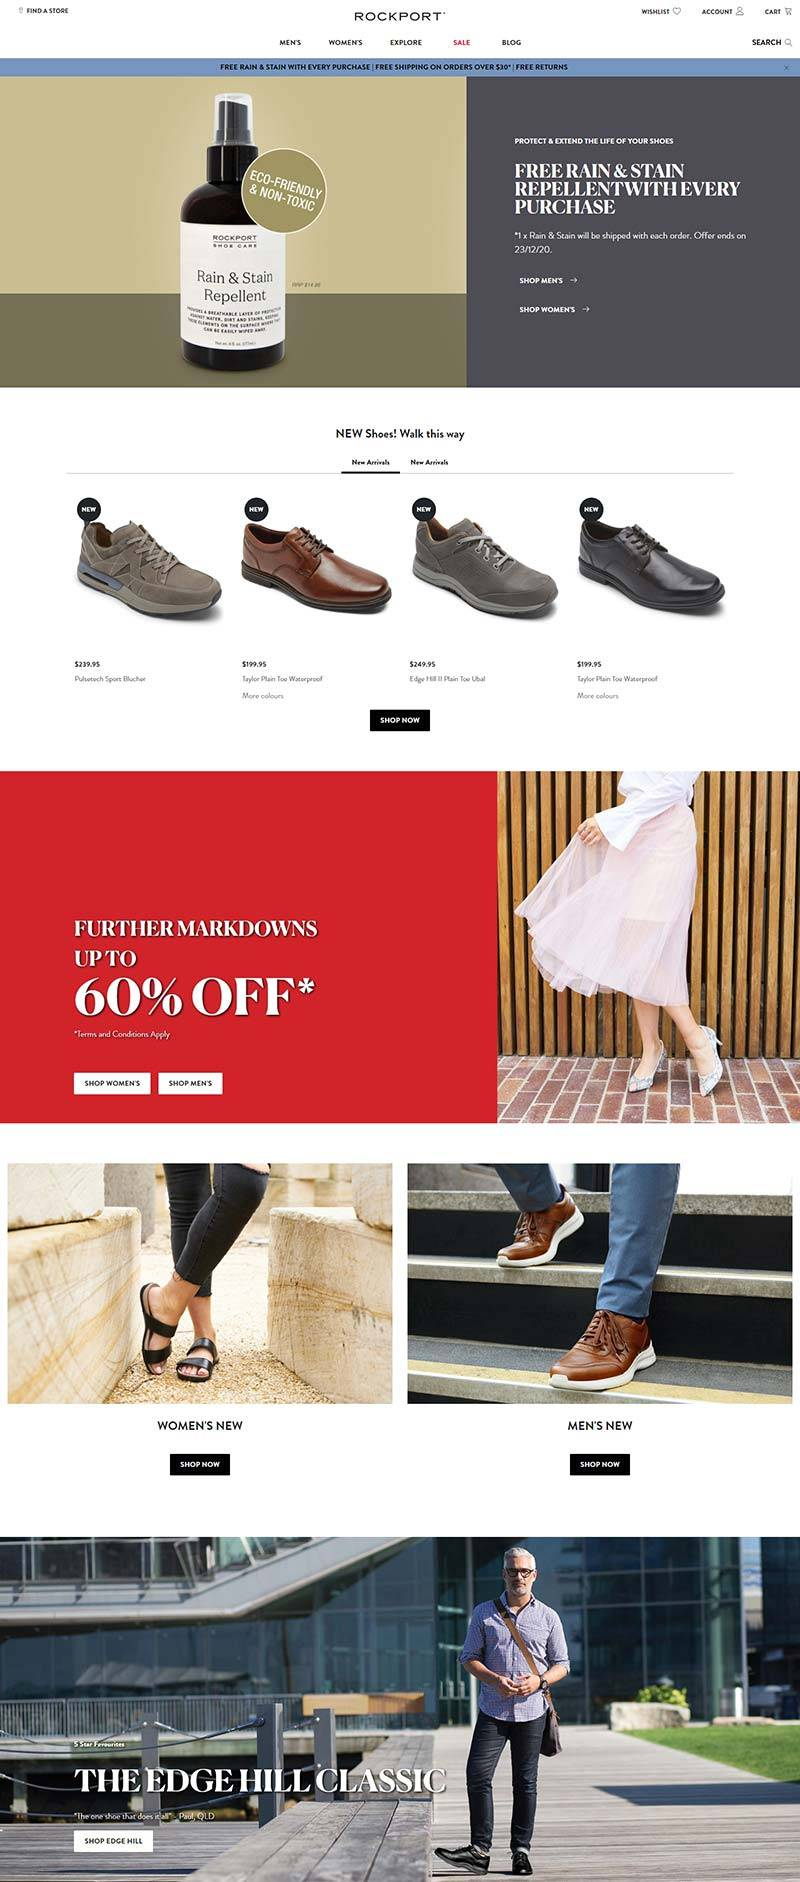 Rockport 美国高科技鞋履品牌网站